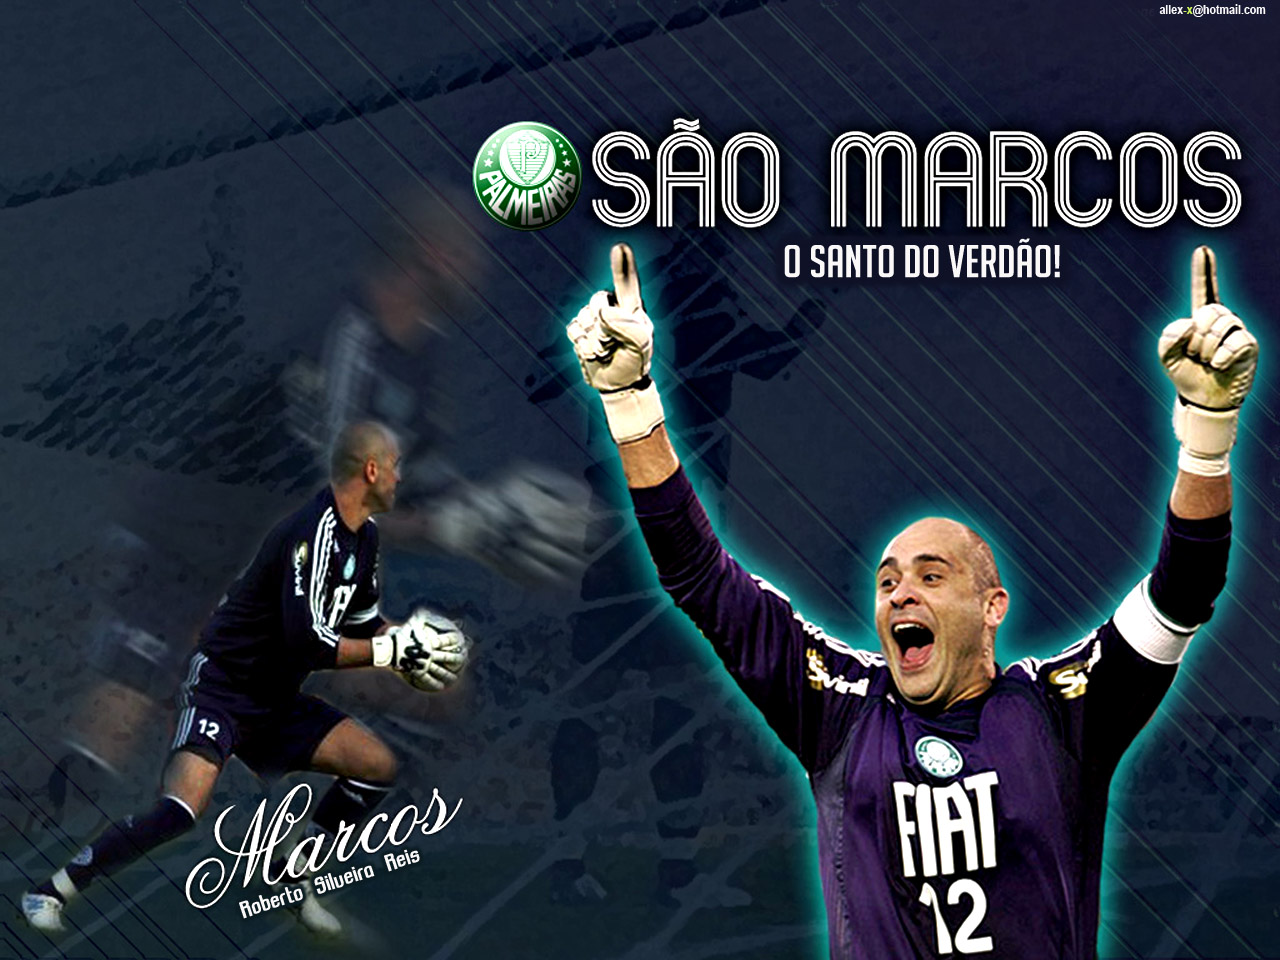 So Marcos [Wallpaper] BLOG DO ALEXX   Jogos Palmeiras e mais 1280x960